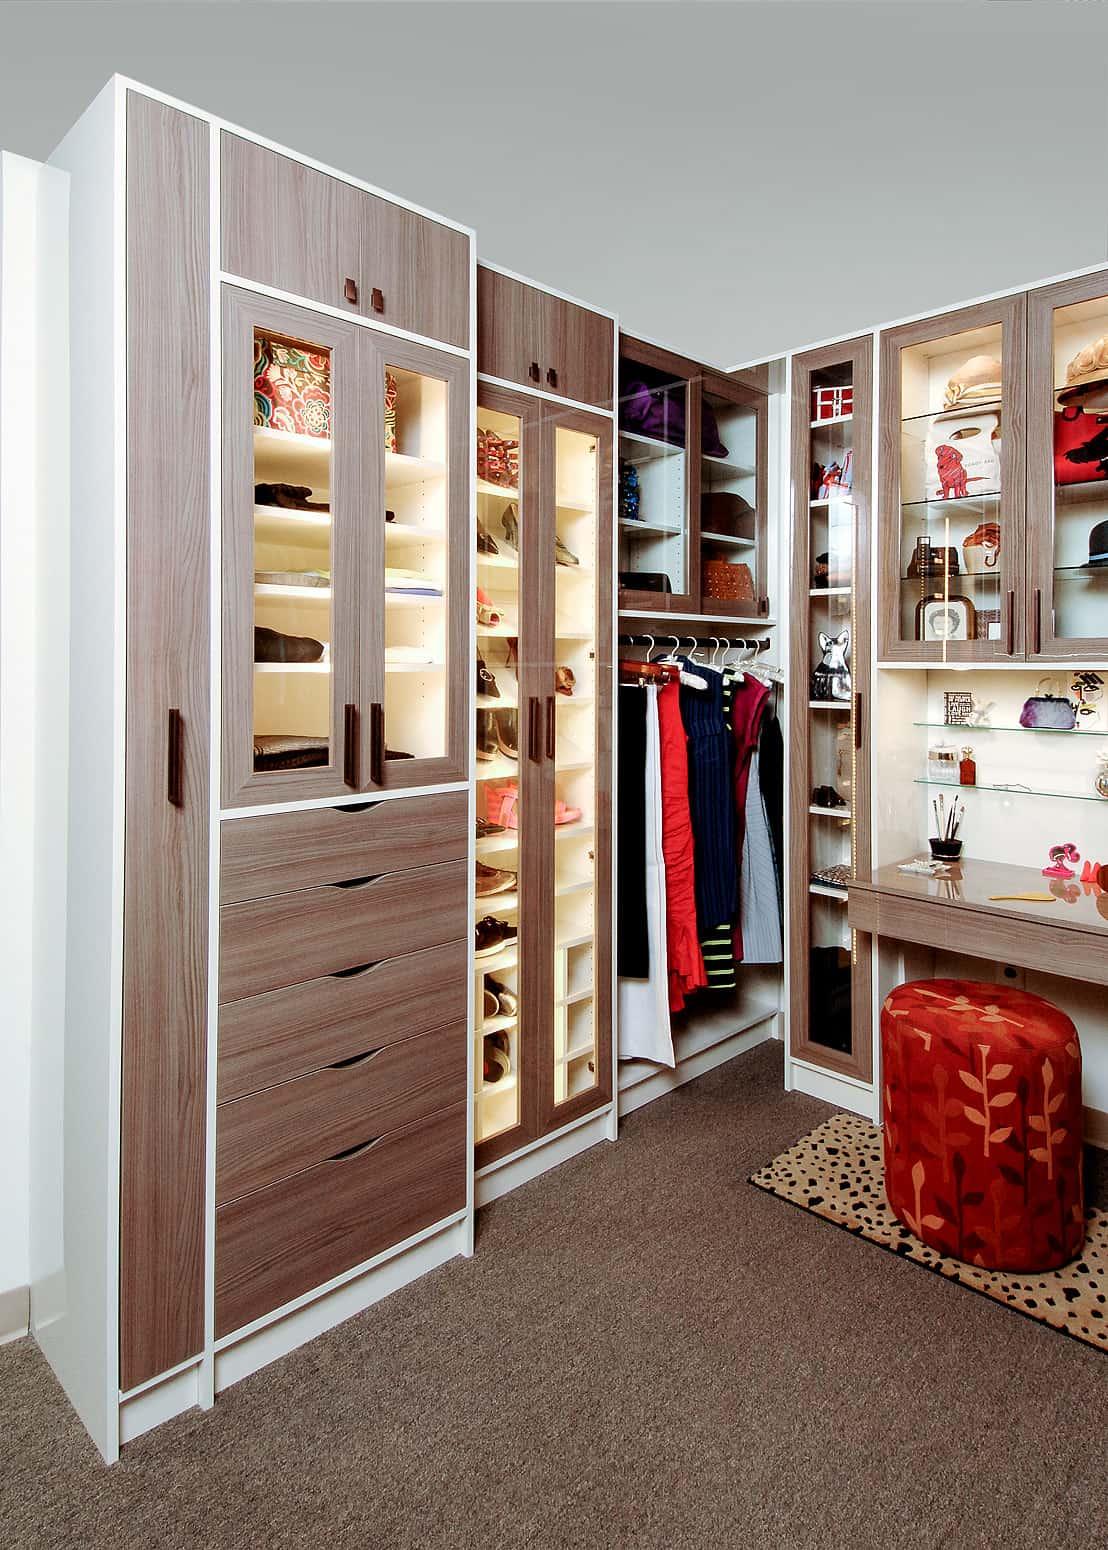 70 Awesome Walk In Closet Ideas Photos